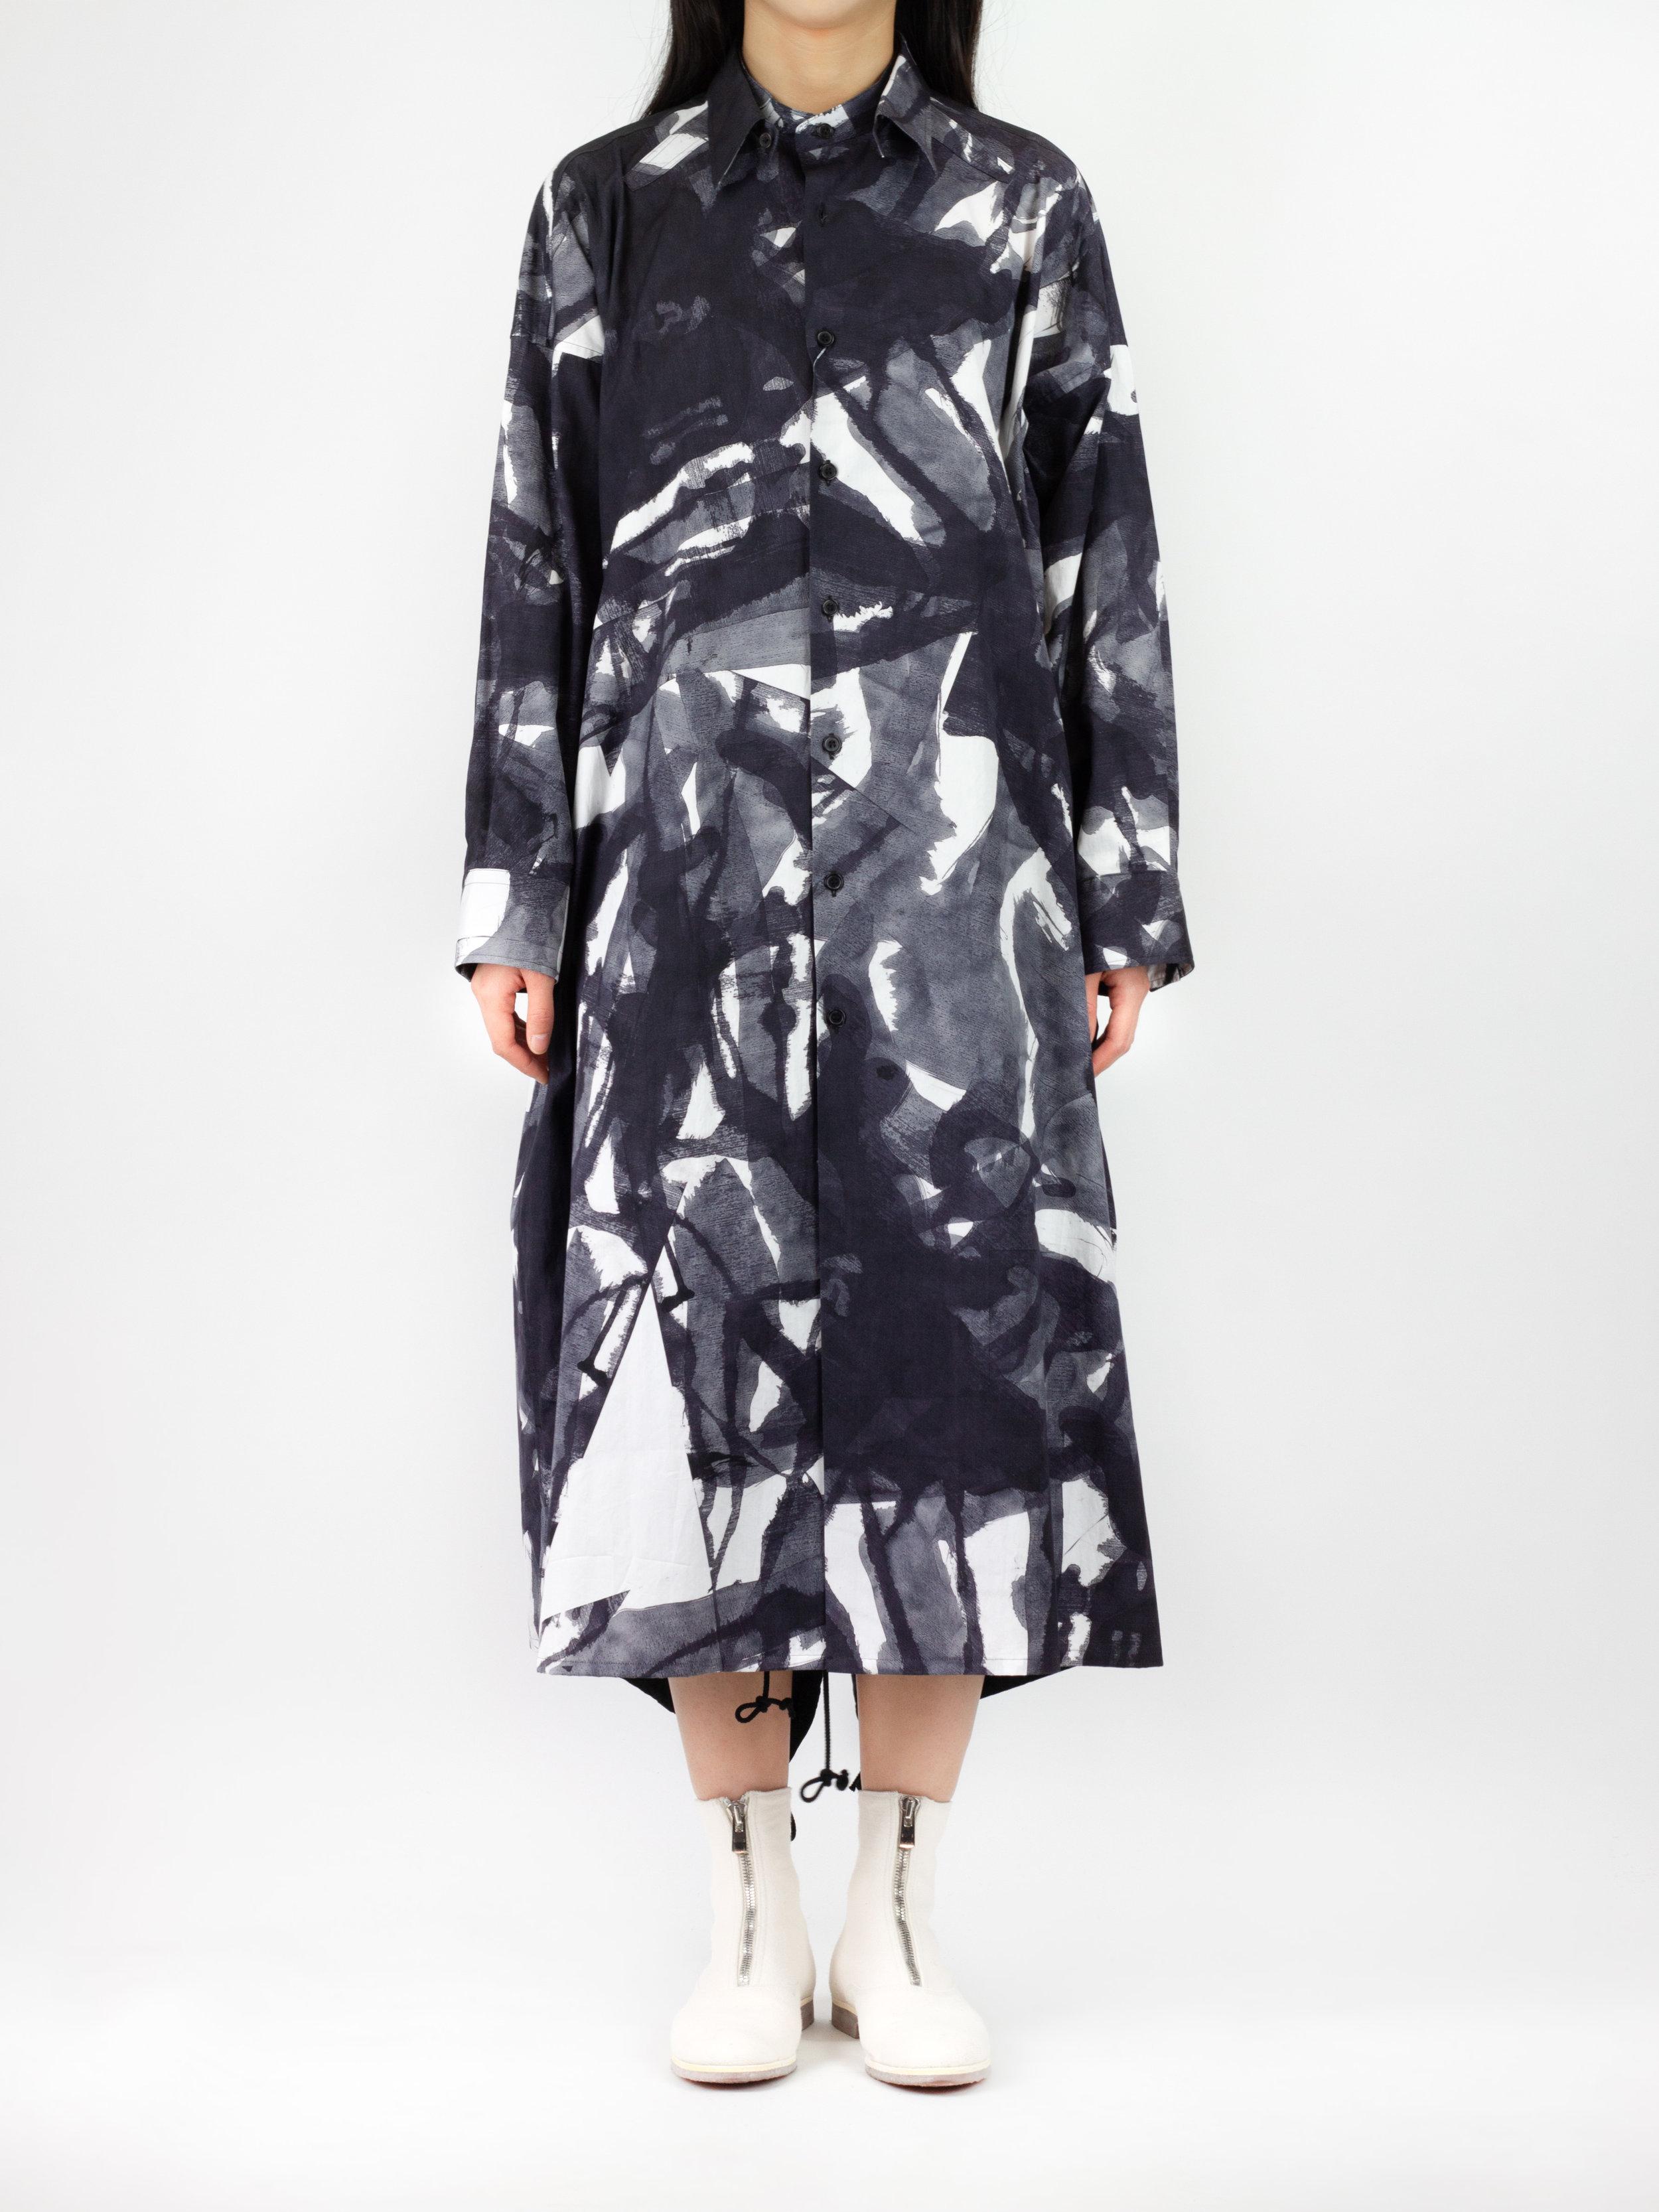 Avant-garde garments photographed for fashion e-commerce